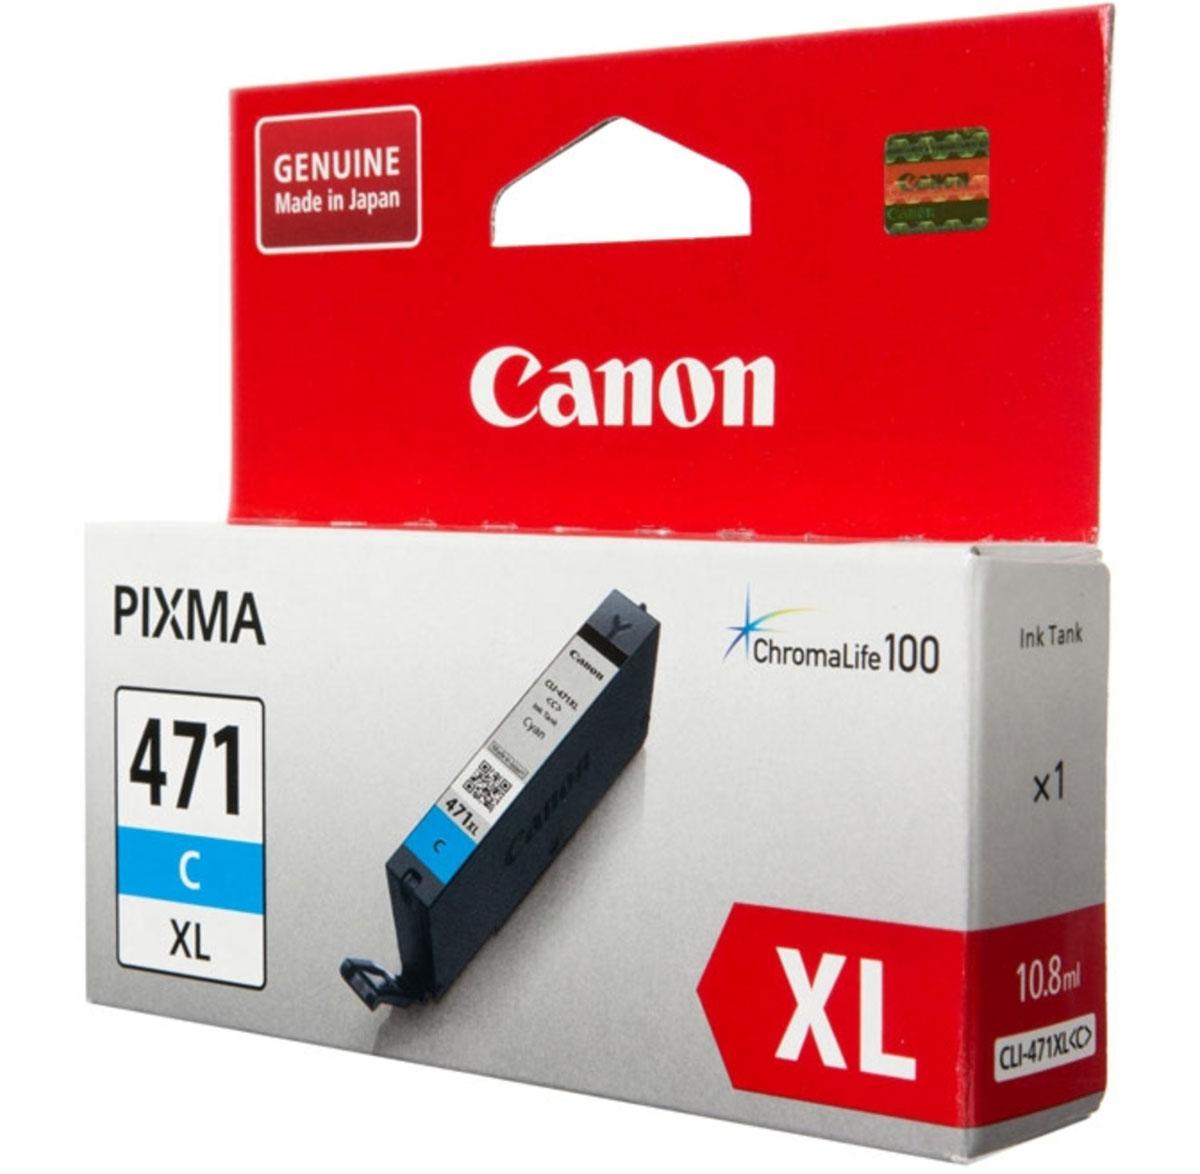 Canon CLI-471XL, Cyan картридж для Pixma MG5740/6840/7740 картридж canon kp 108in 3115b001